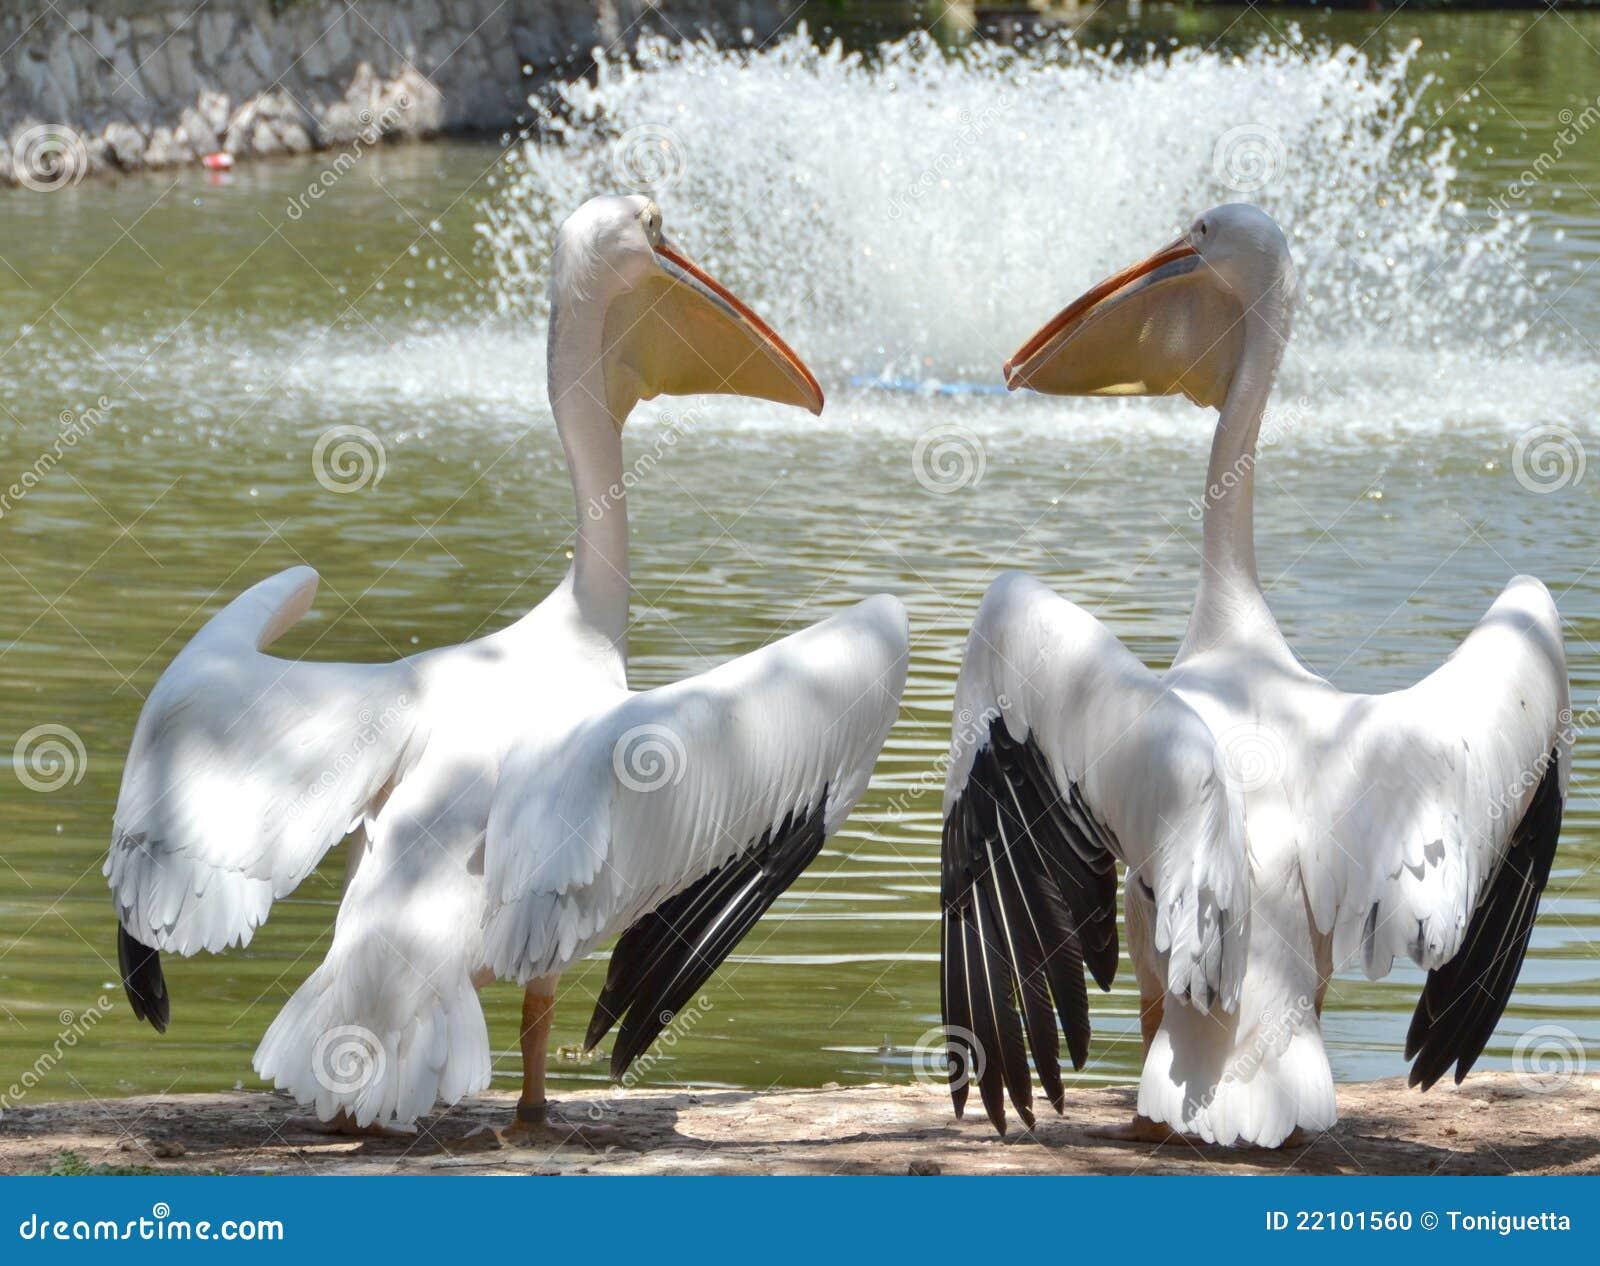 pelican lake single muslim girls Pelican rapids was a stroke back with 202, followed by hawley 214, frazee 220,  dilworth-glyndon-felton 234, and breckenridge 286 perham.